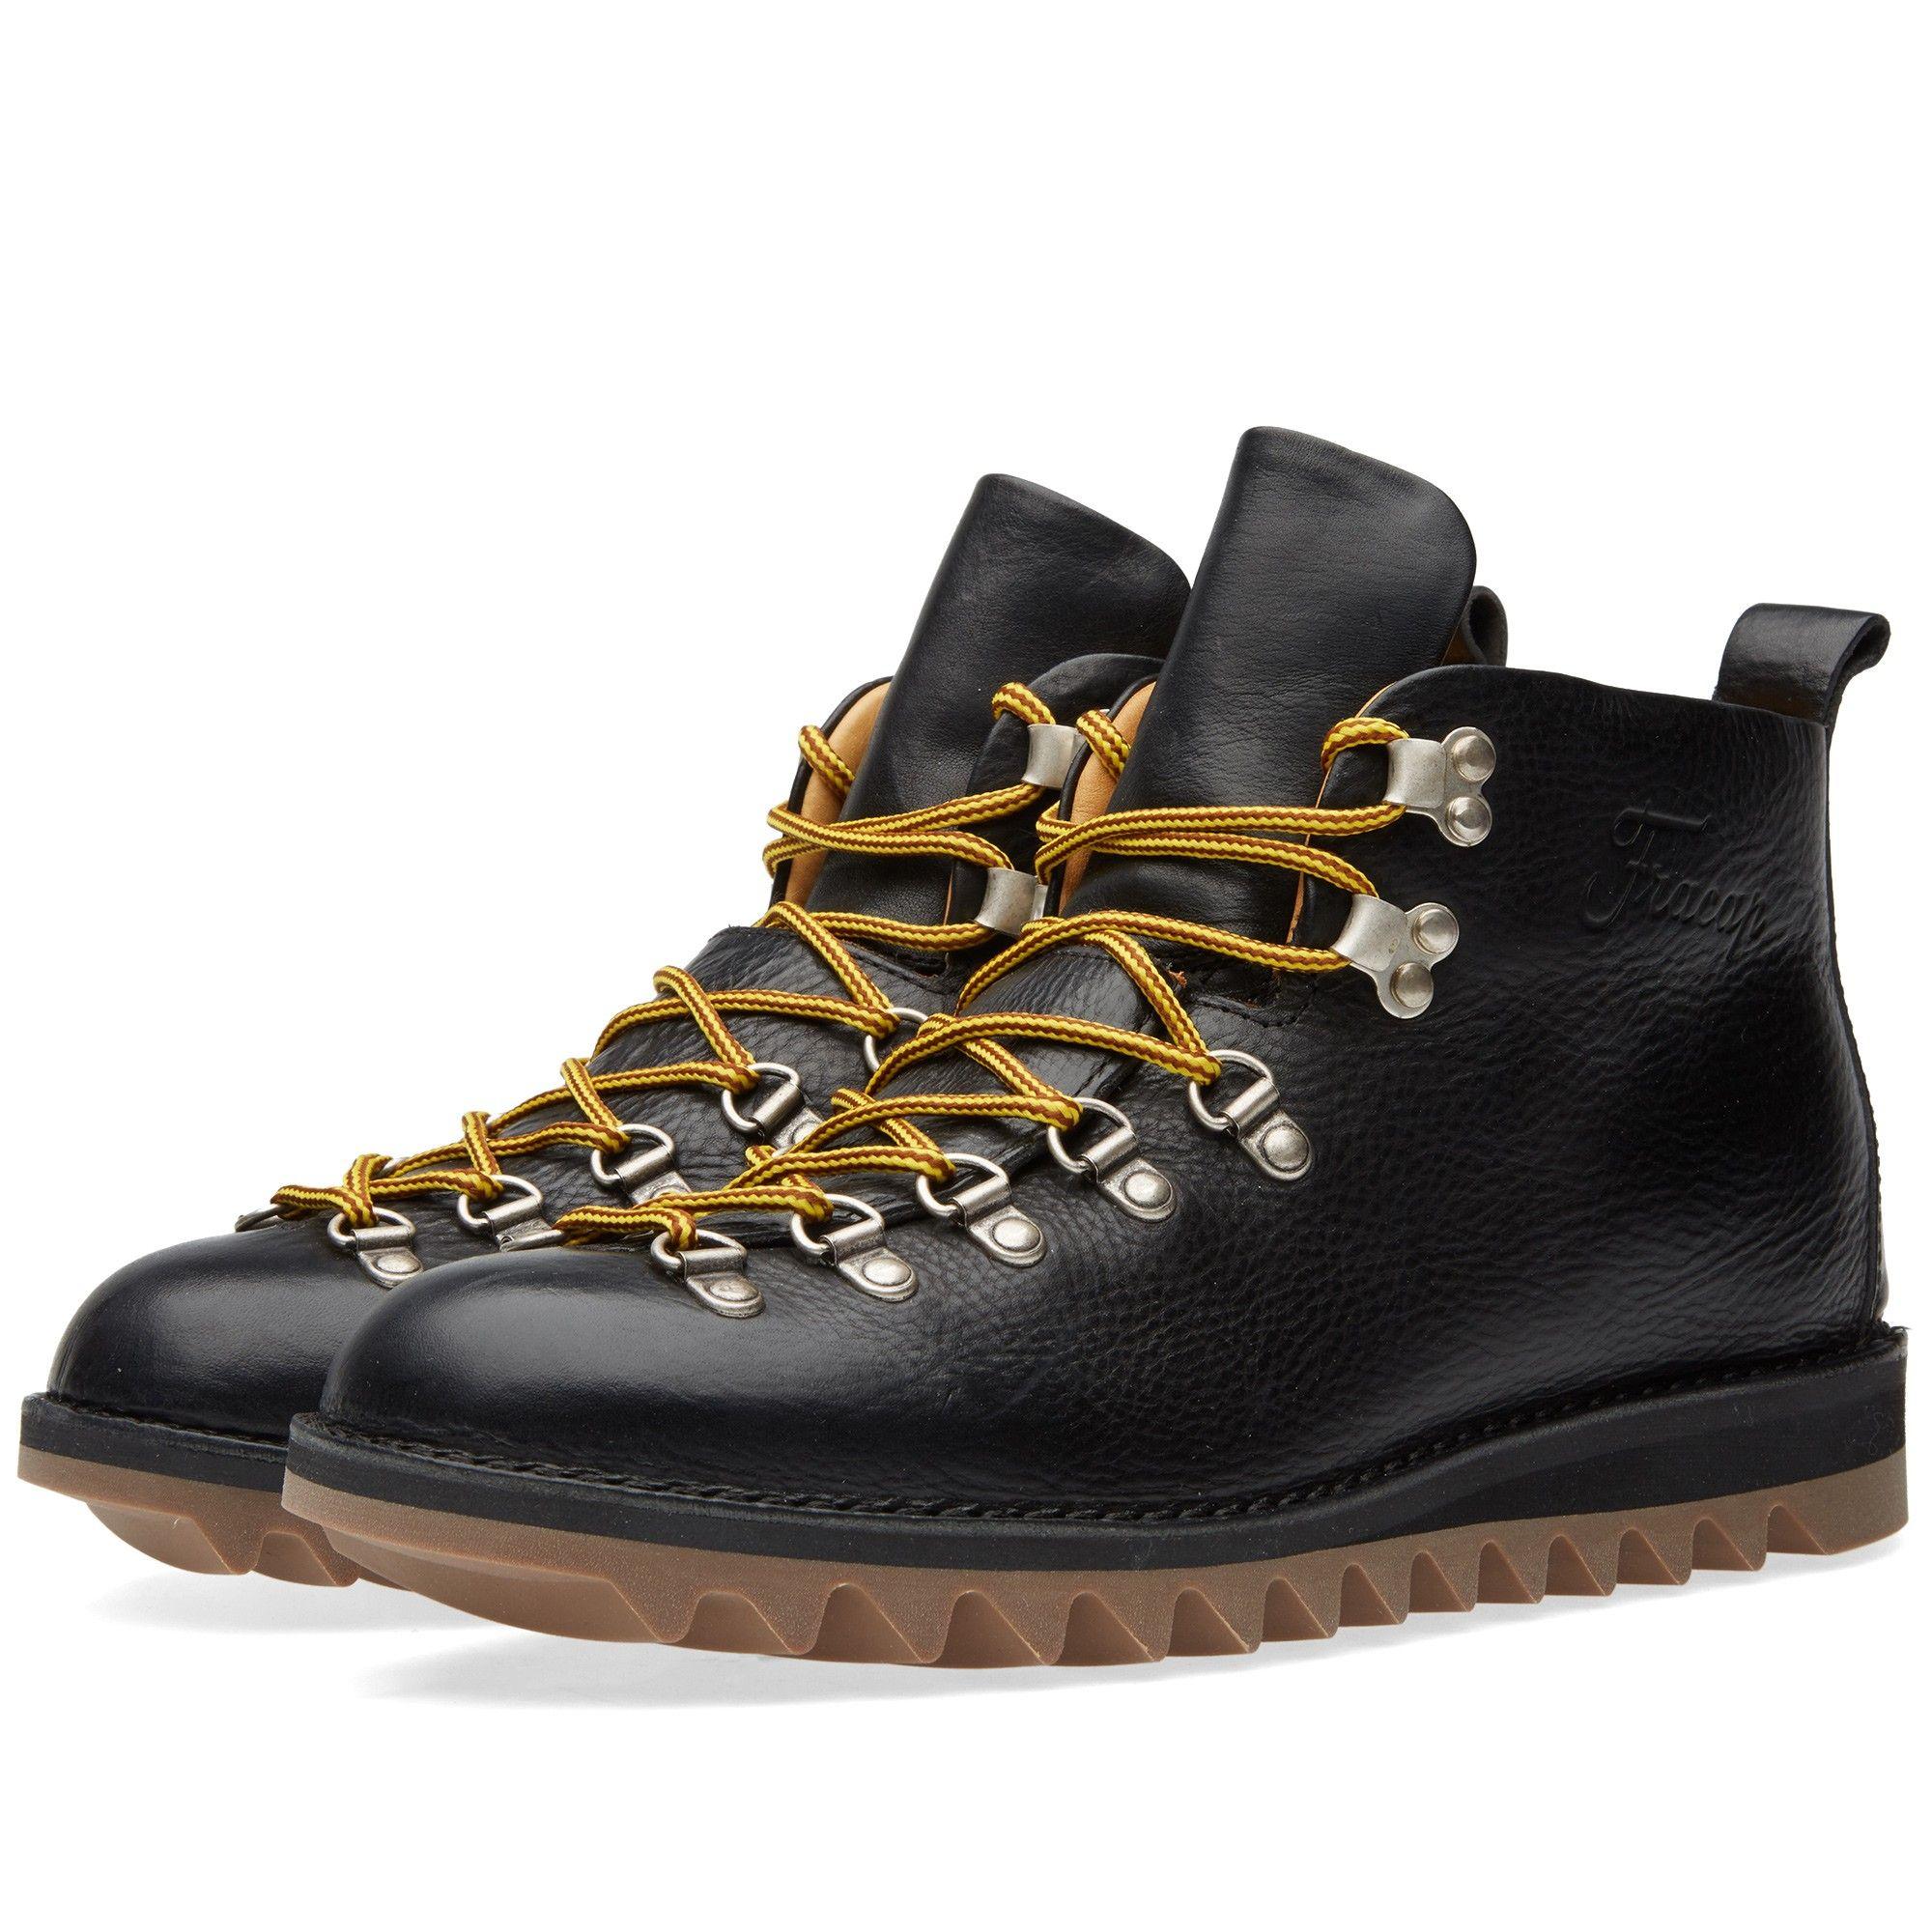 Fracap M120 Ripple Sole Scarponcino Boot (Black)